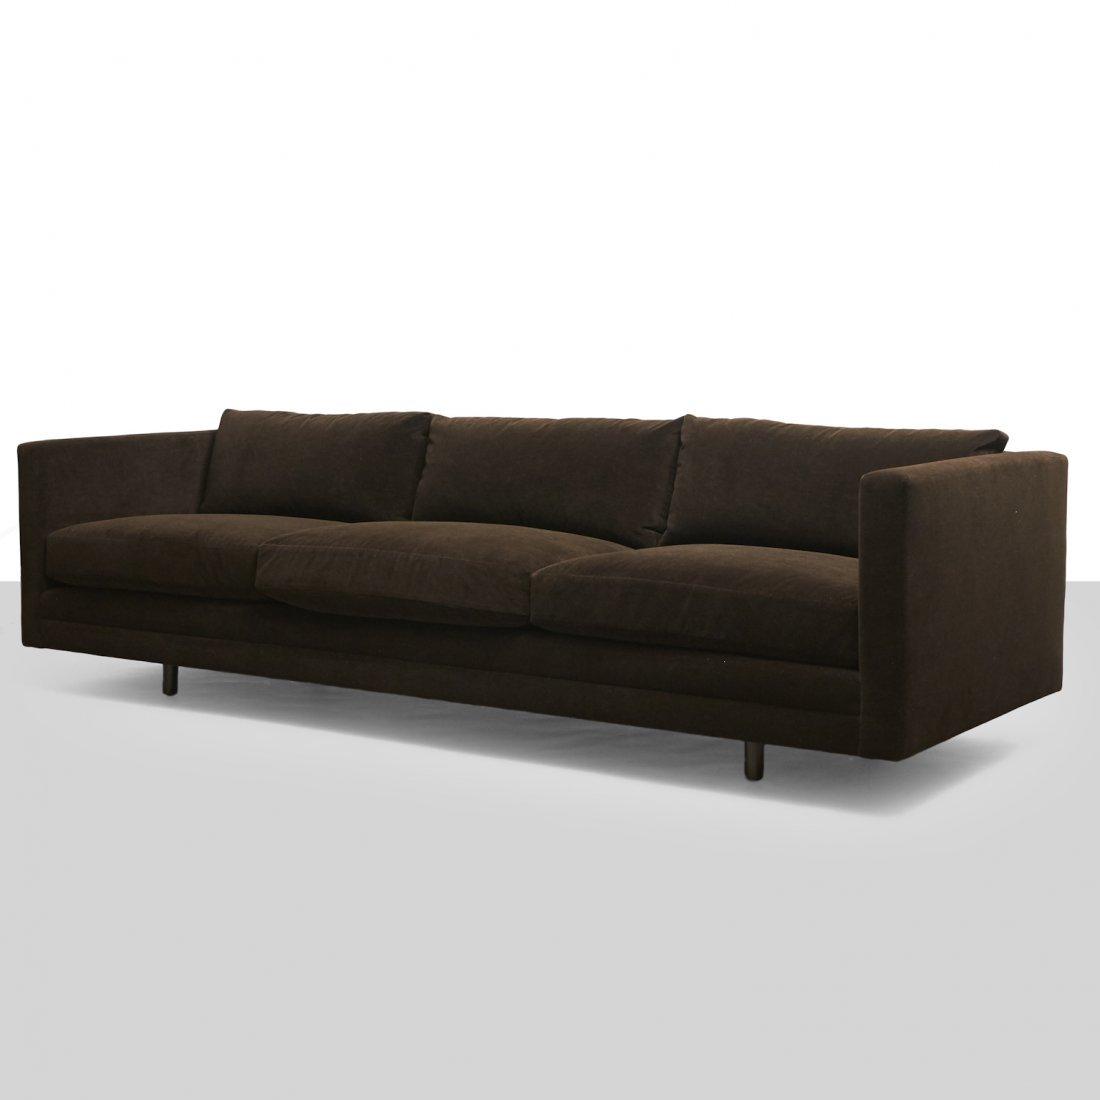 Harvey Probber, Sofa